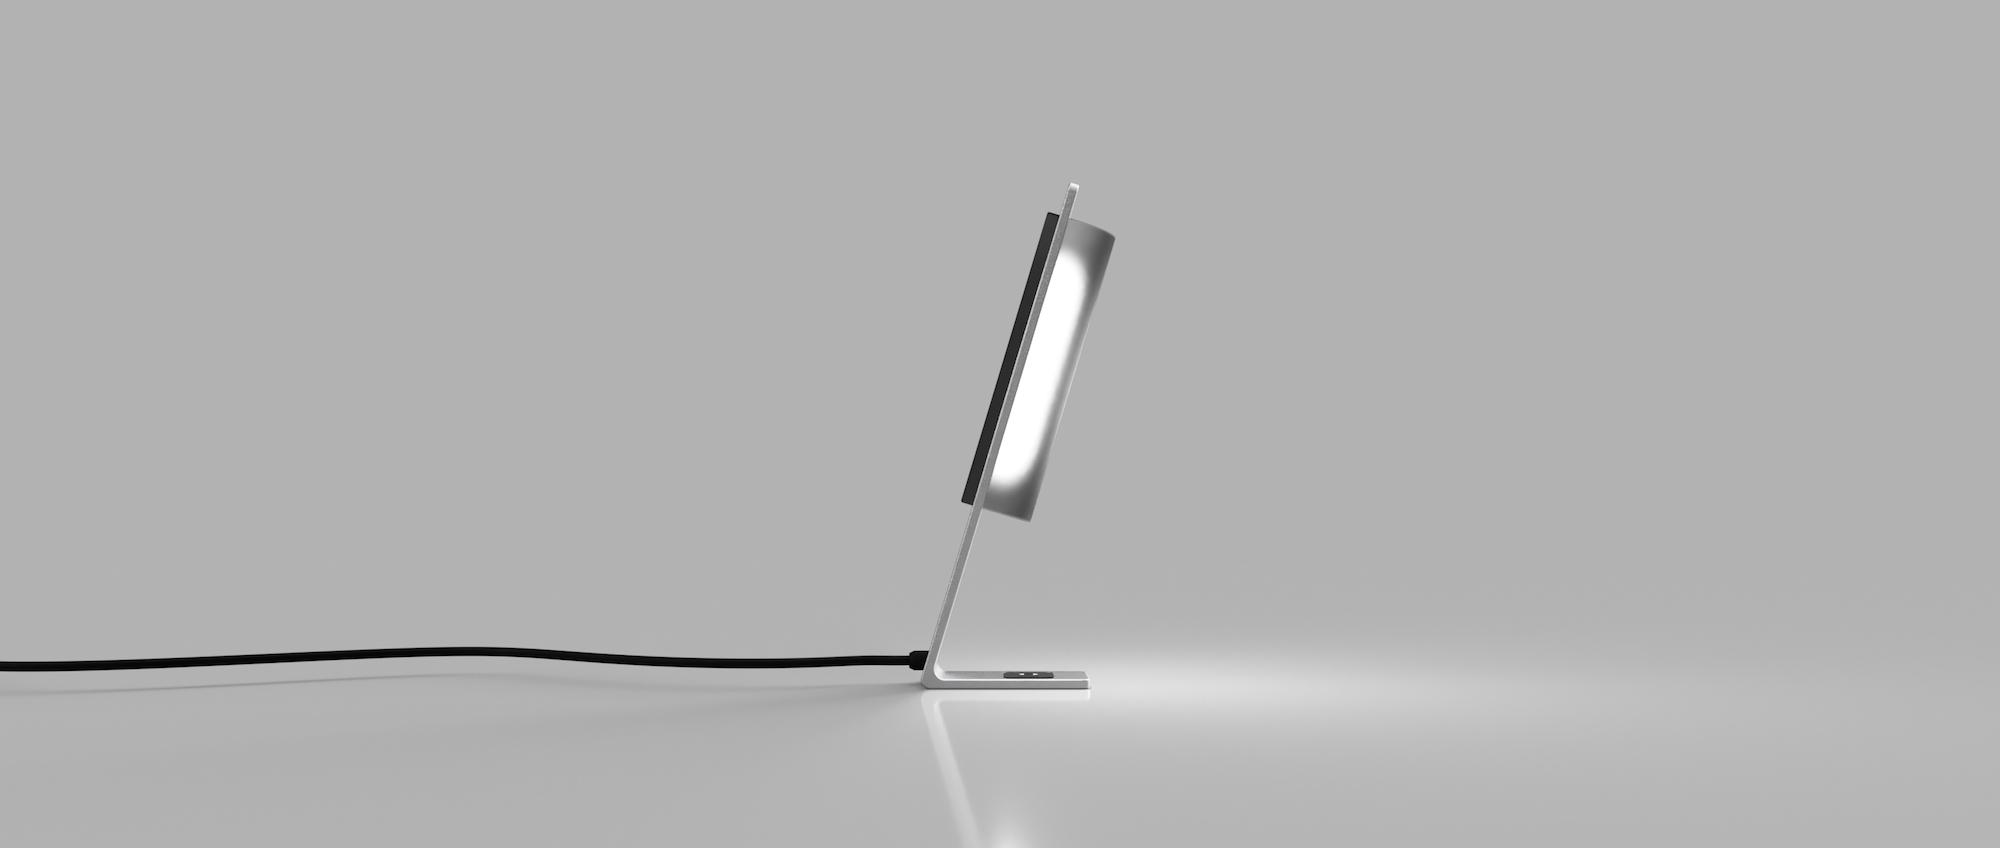 LED ANGLED DESK LAMP